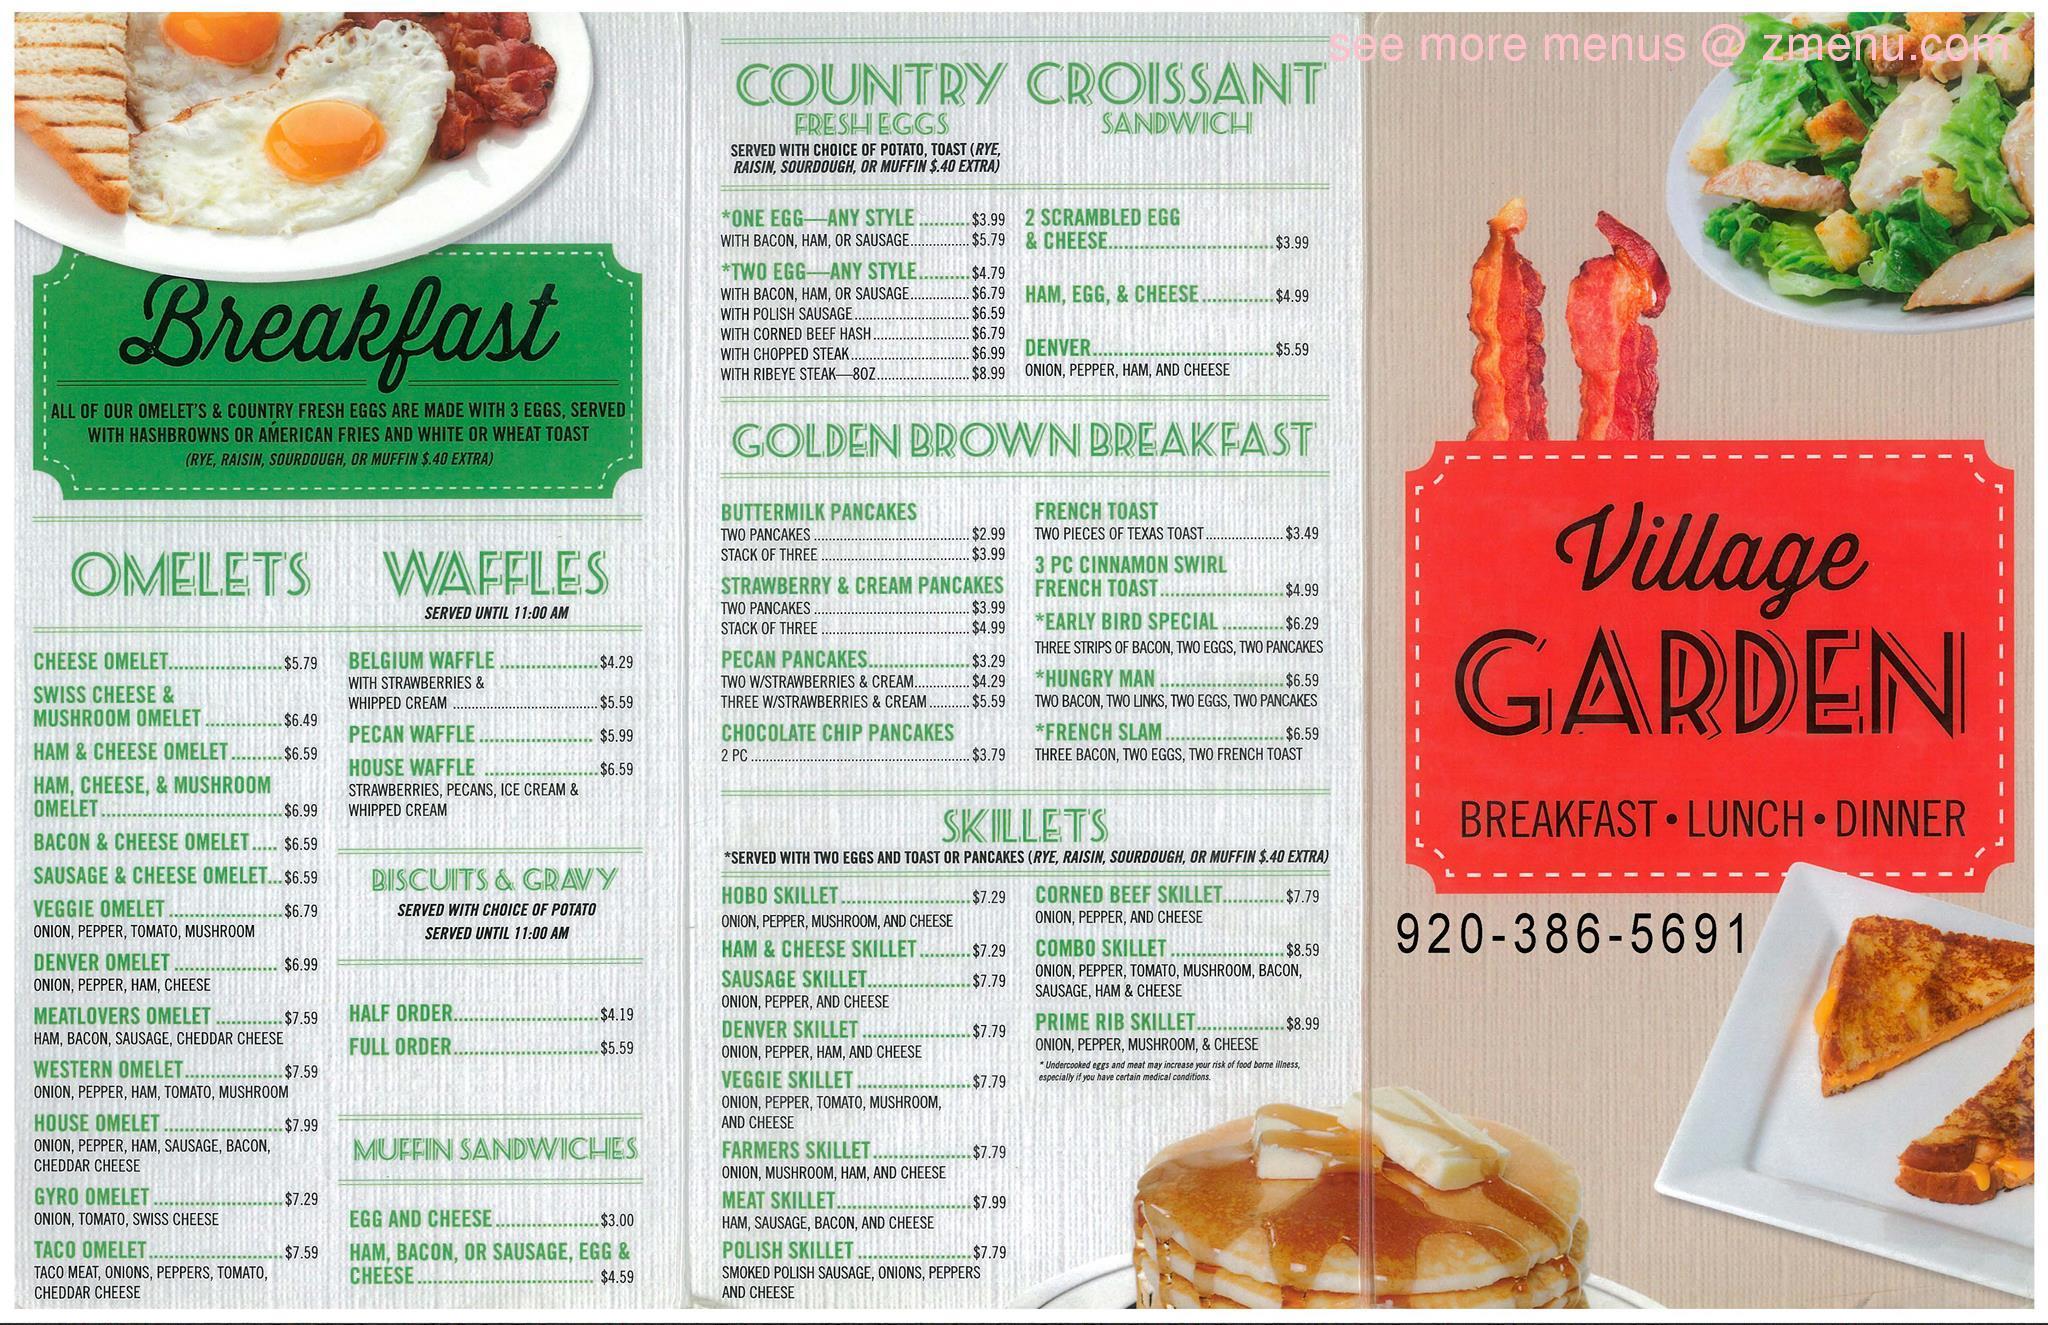 Online menu of village garden restaurant restaurant for 388 new american cuisine